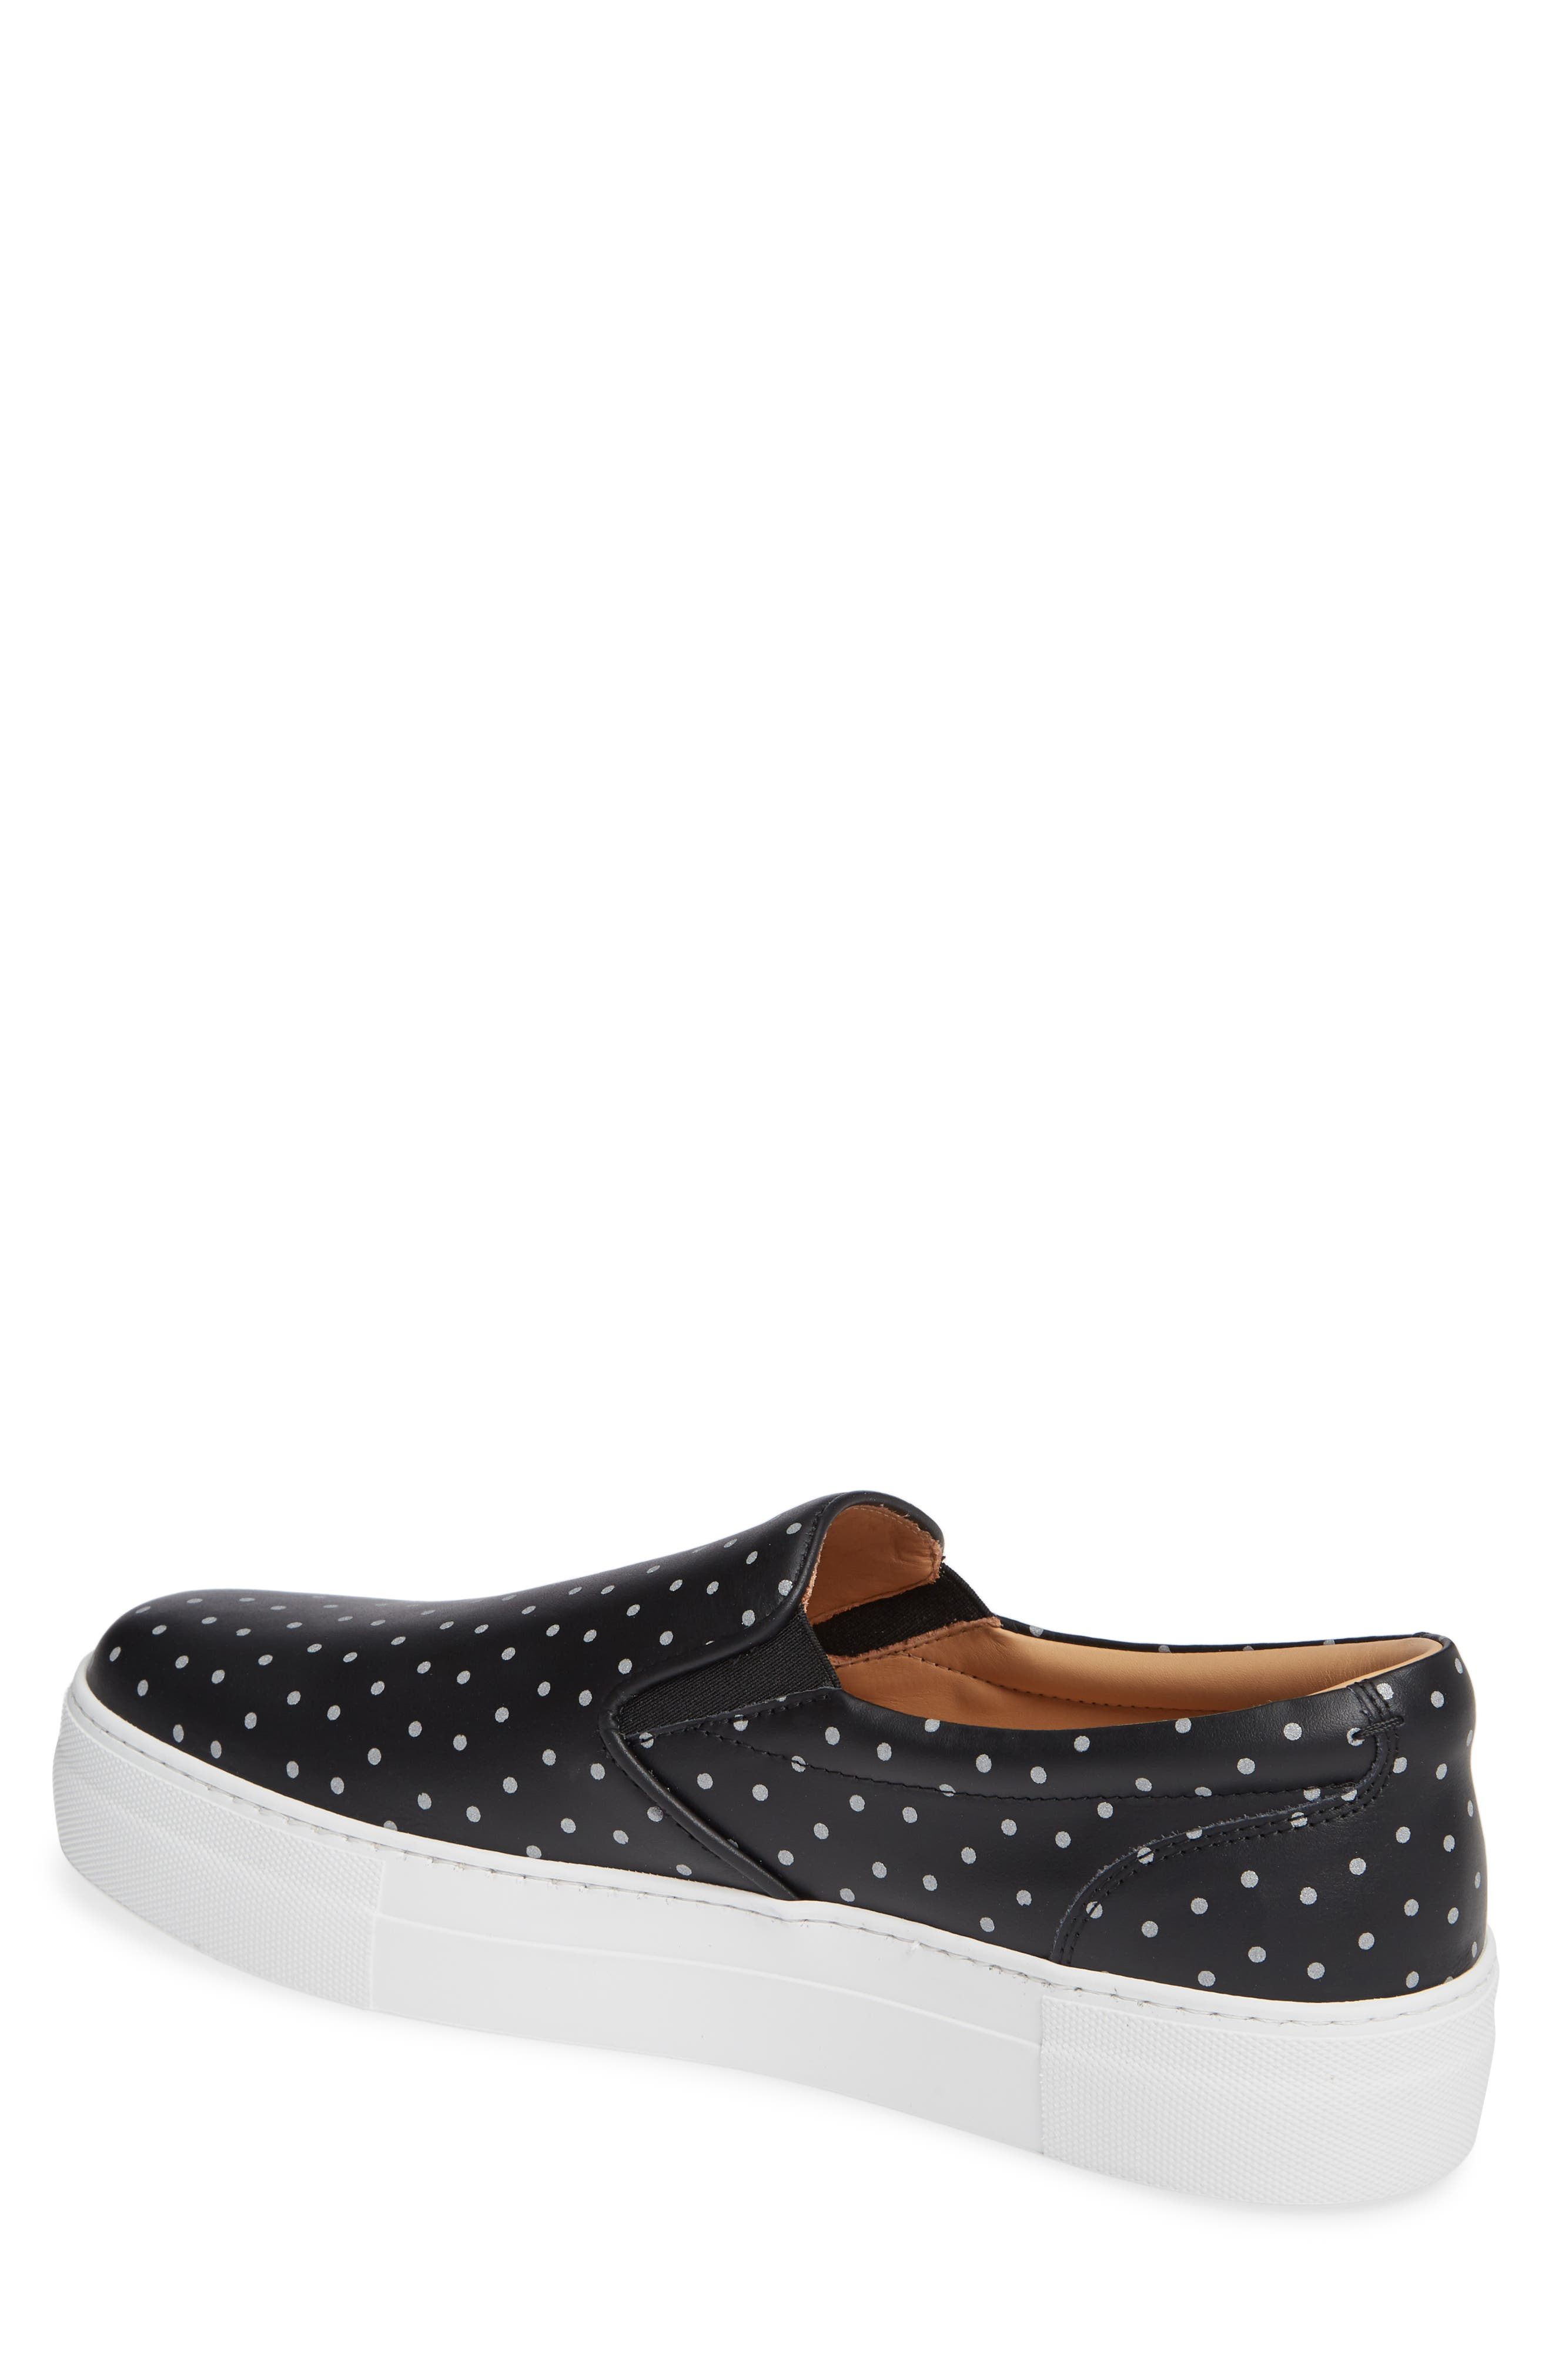 Nick Wooster x GREATS Slip-On Sneaker,                             Alternate thumbnail 2, color,                             BLACK W/ 3M DOTS